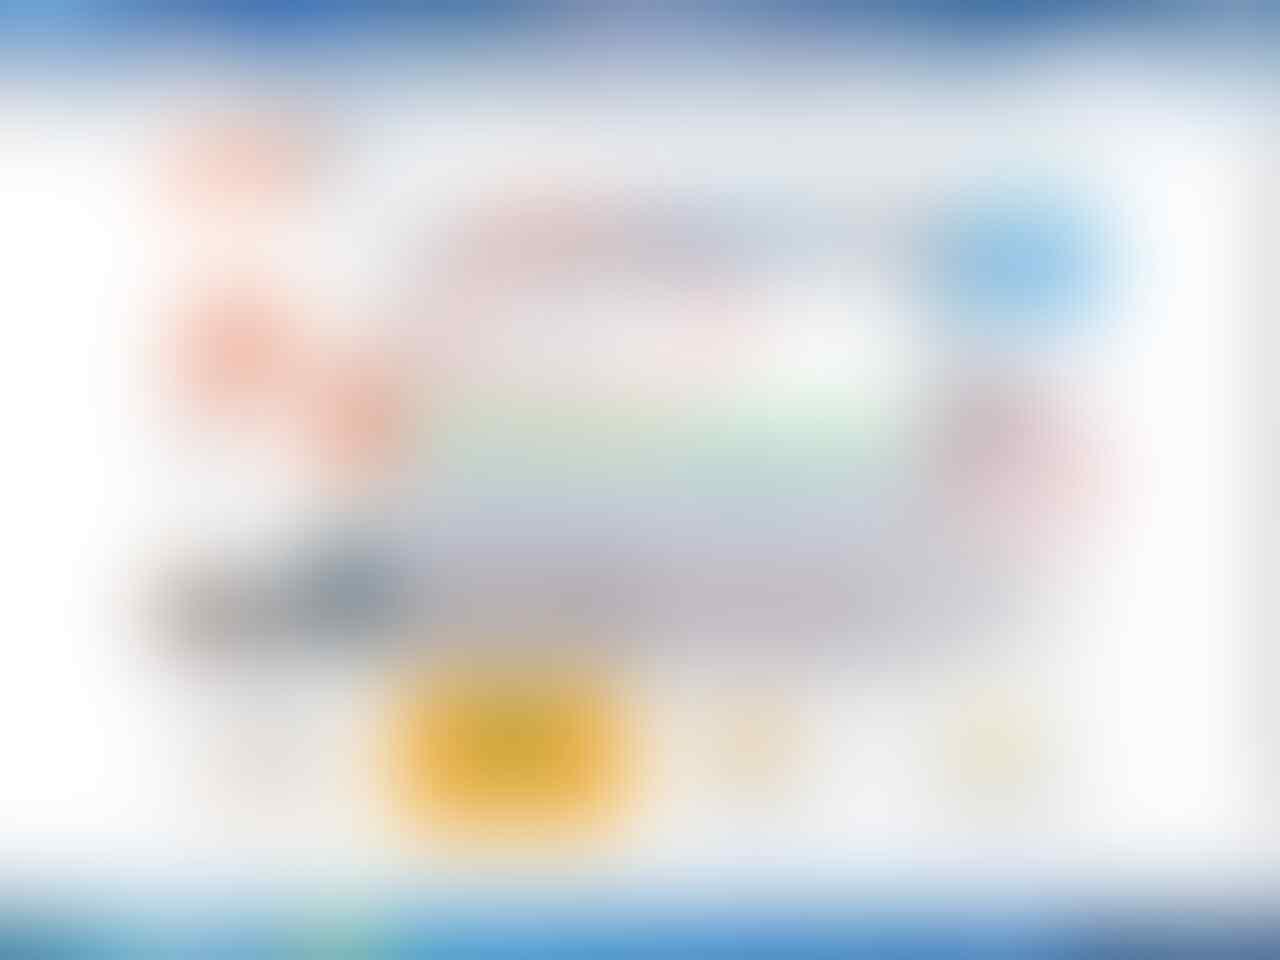 [Community] BOLT SUPER 4G/LTE